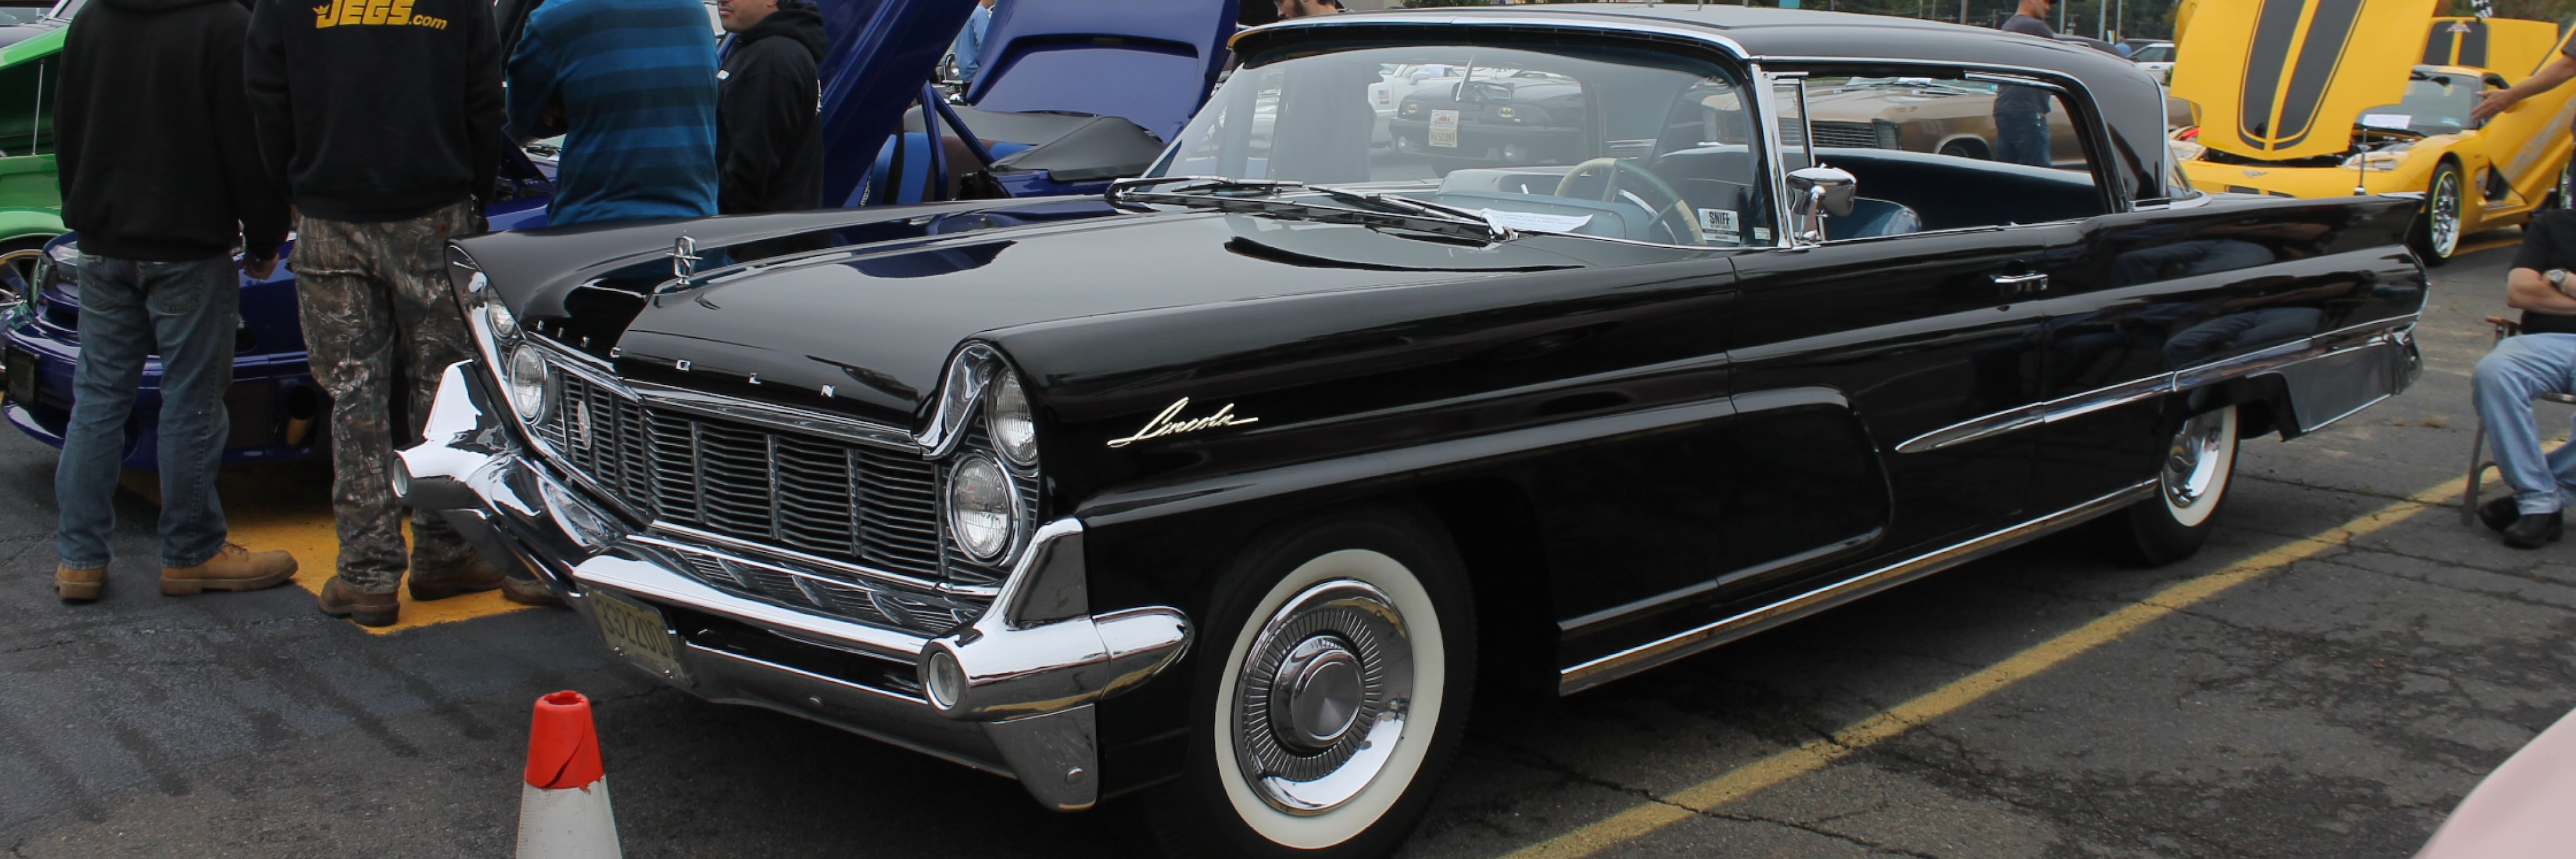 Lincoln Of Wayne New Lincoln Dealership In Wayne Nj 07470